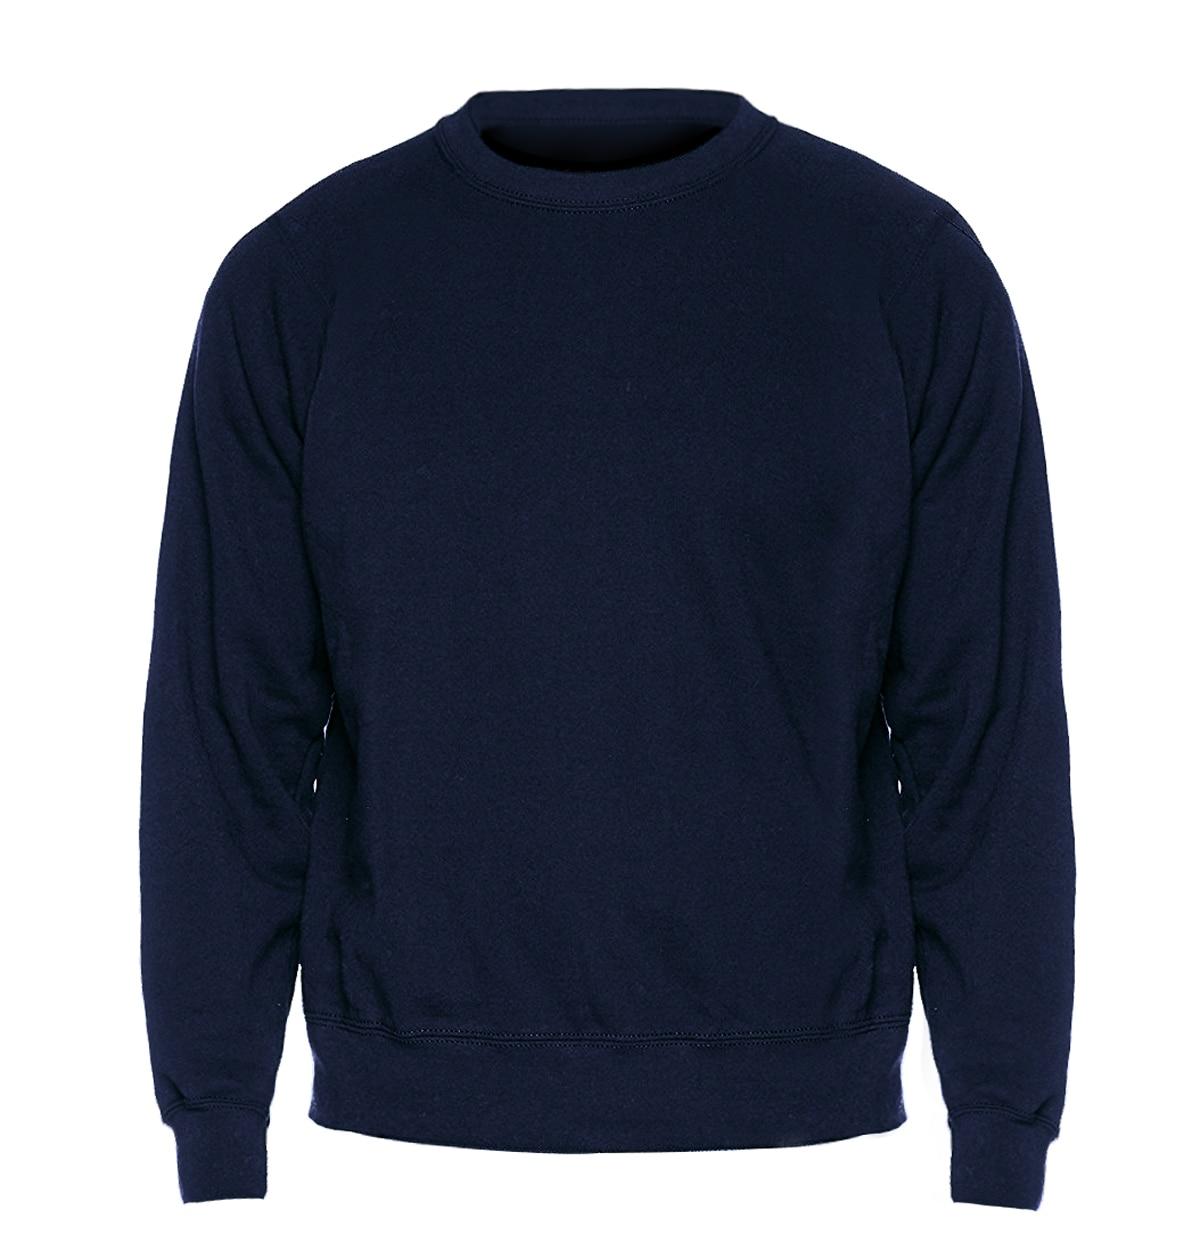 Solid color Sweatshirt Men Hoodie Crewneck Sweatshirts Winter Autumn Fleece Hoody Casual Gray Blue Red Black White Streetwear 10